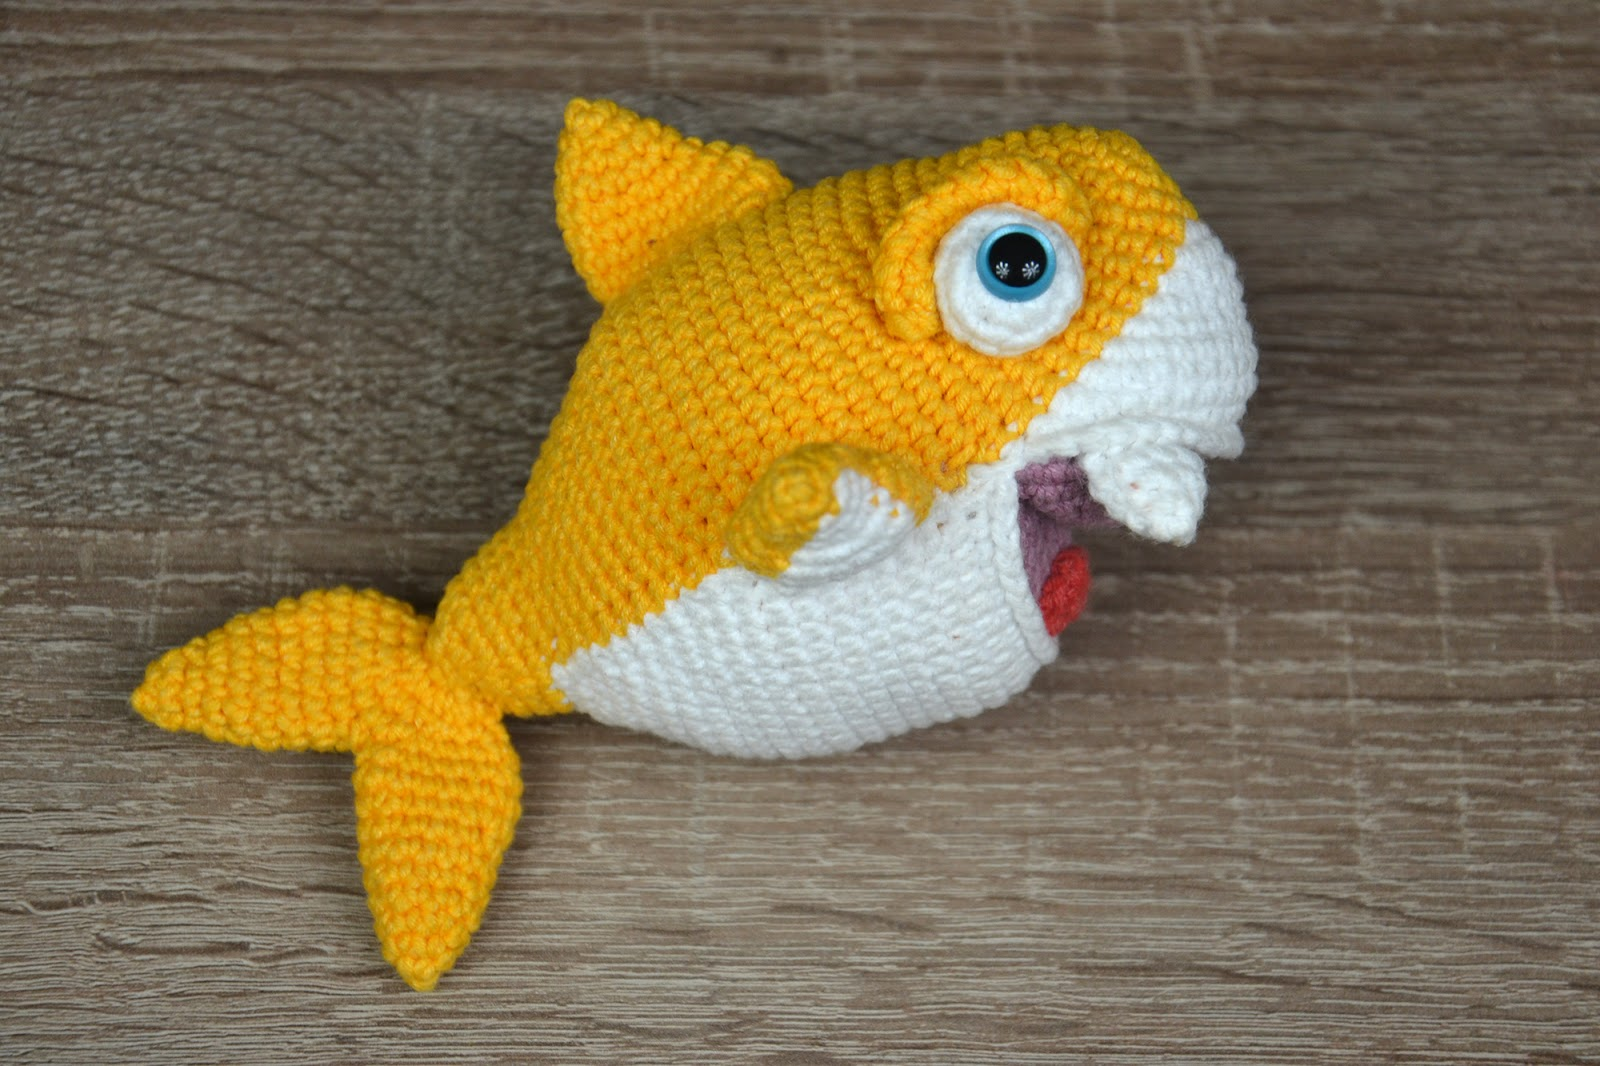 Amigurumi Shark Keychain Crochet Free Patterns | Crochet keychain ... | 1066x1600